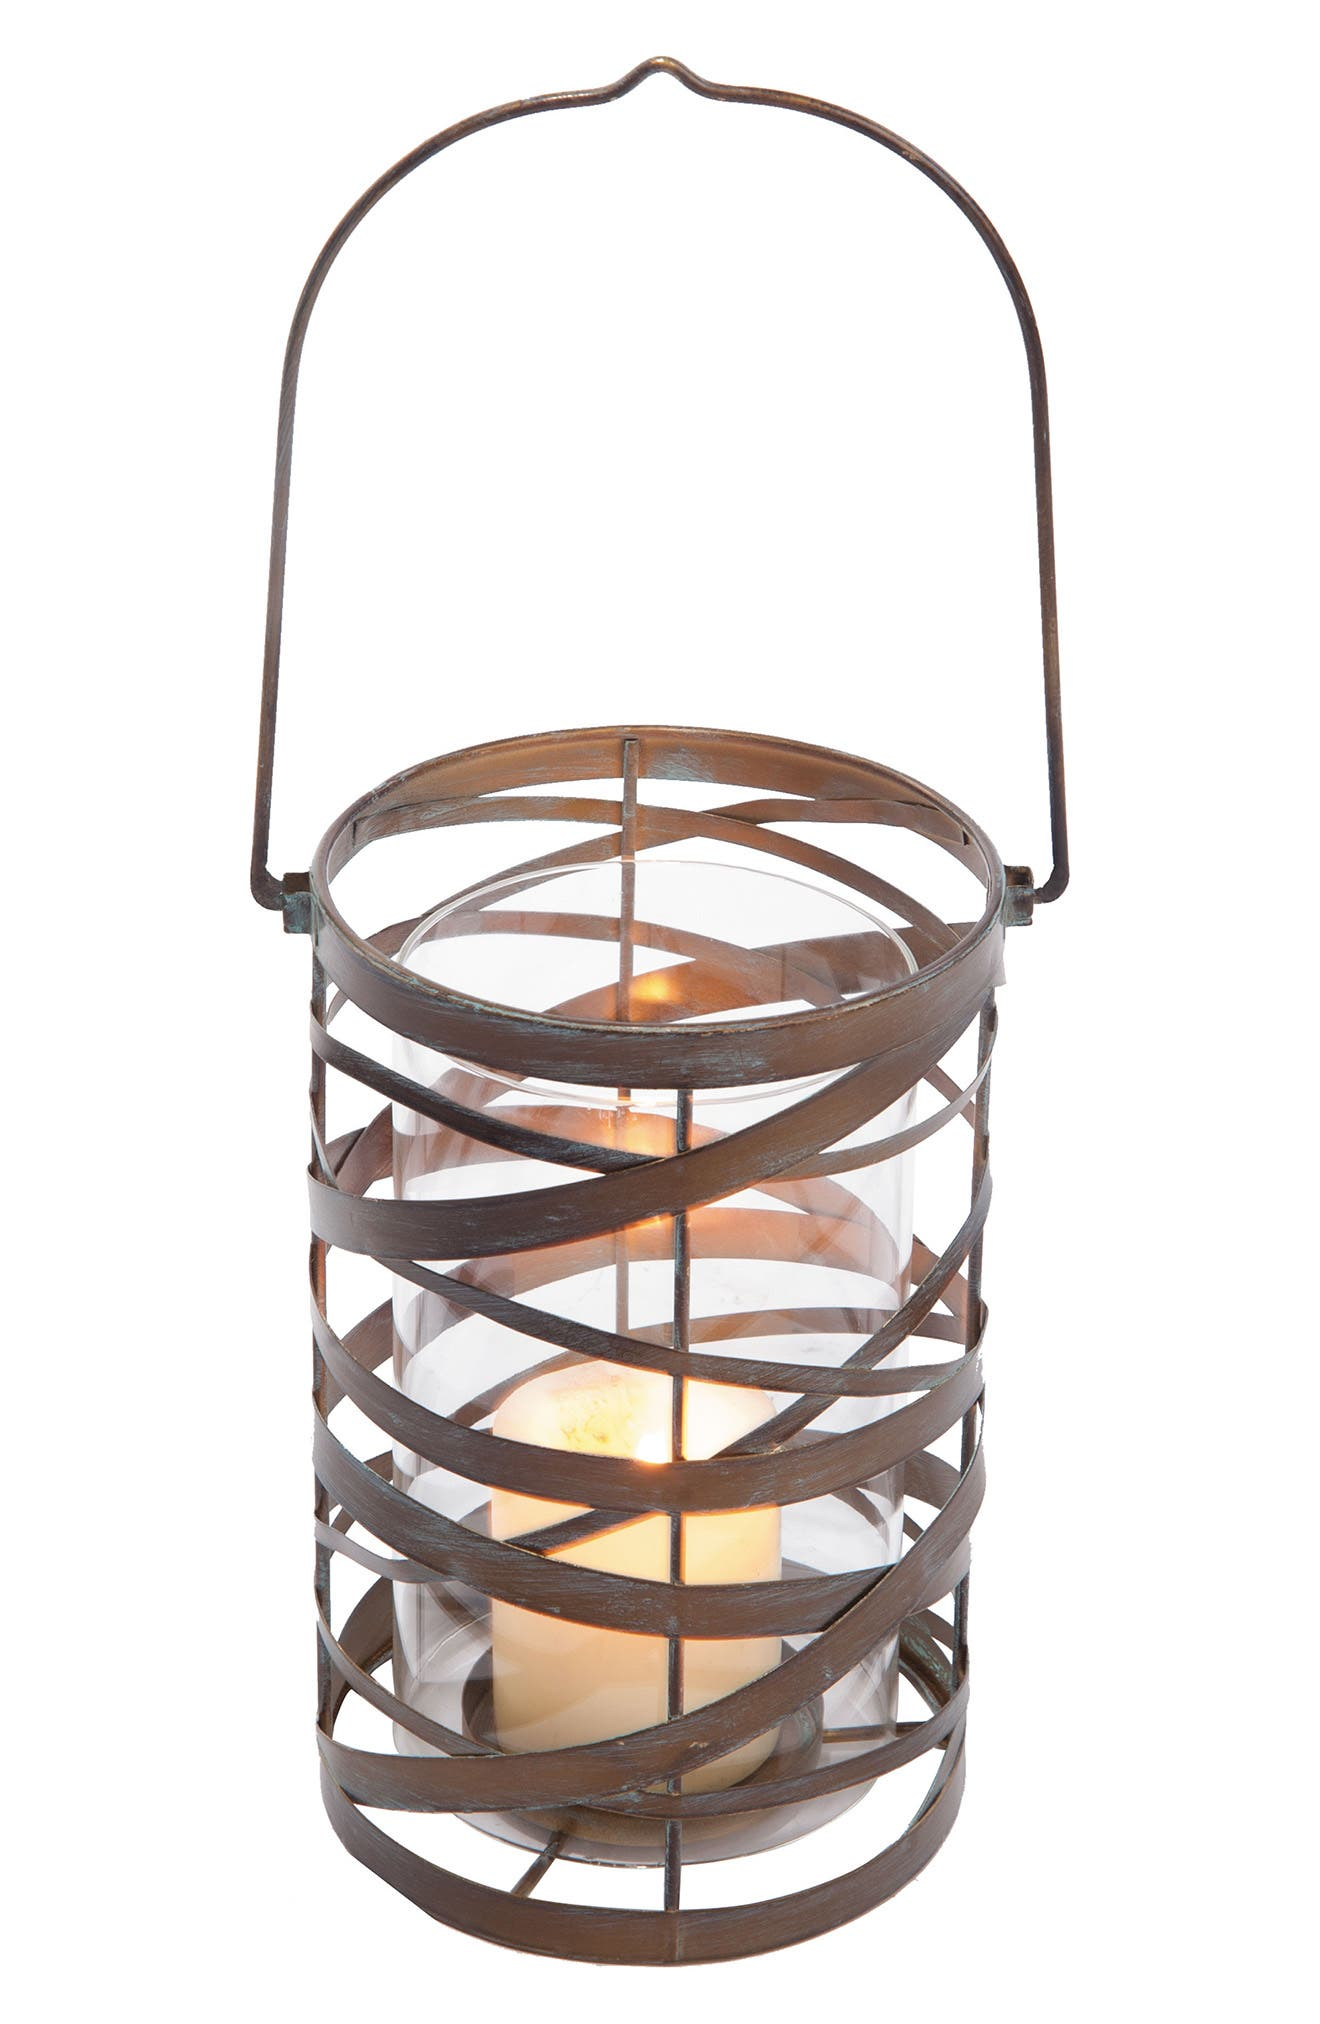 Coil Lantern Candleholder,                             Main thumbnail 1, color,                             200